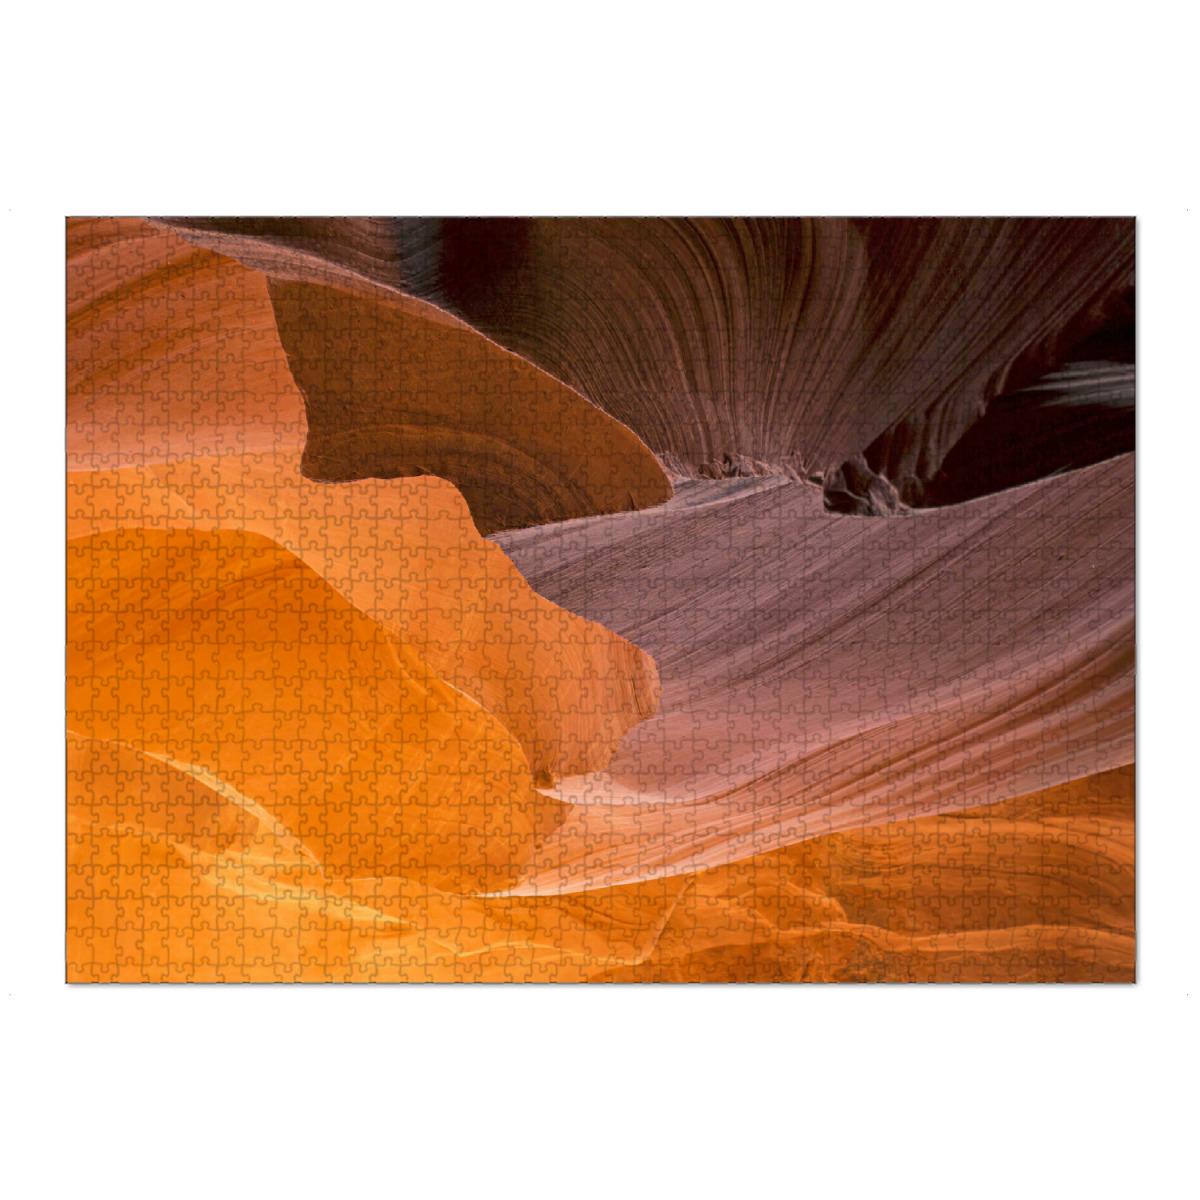 Faszination Antelope Canyon